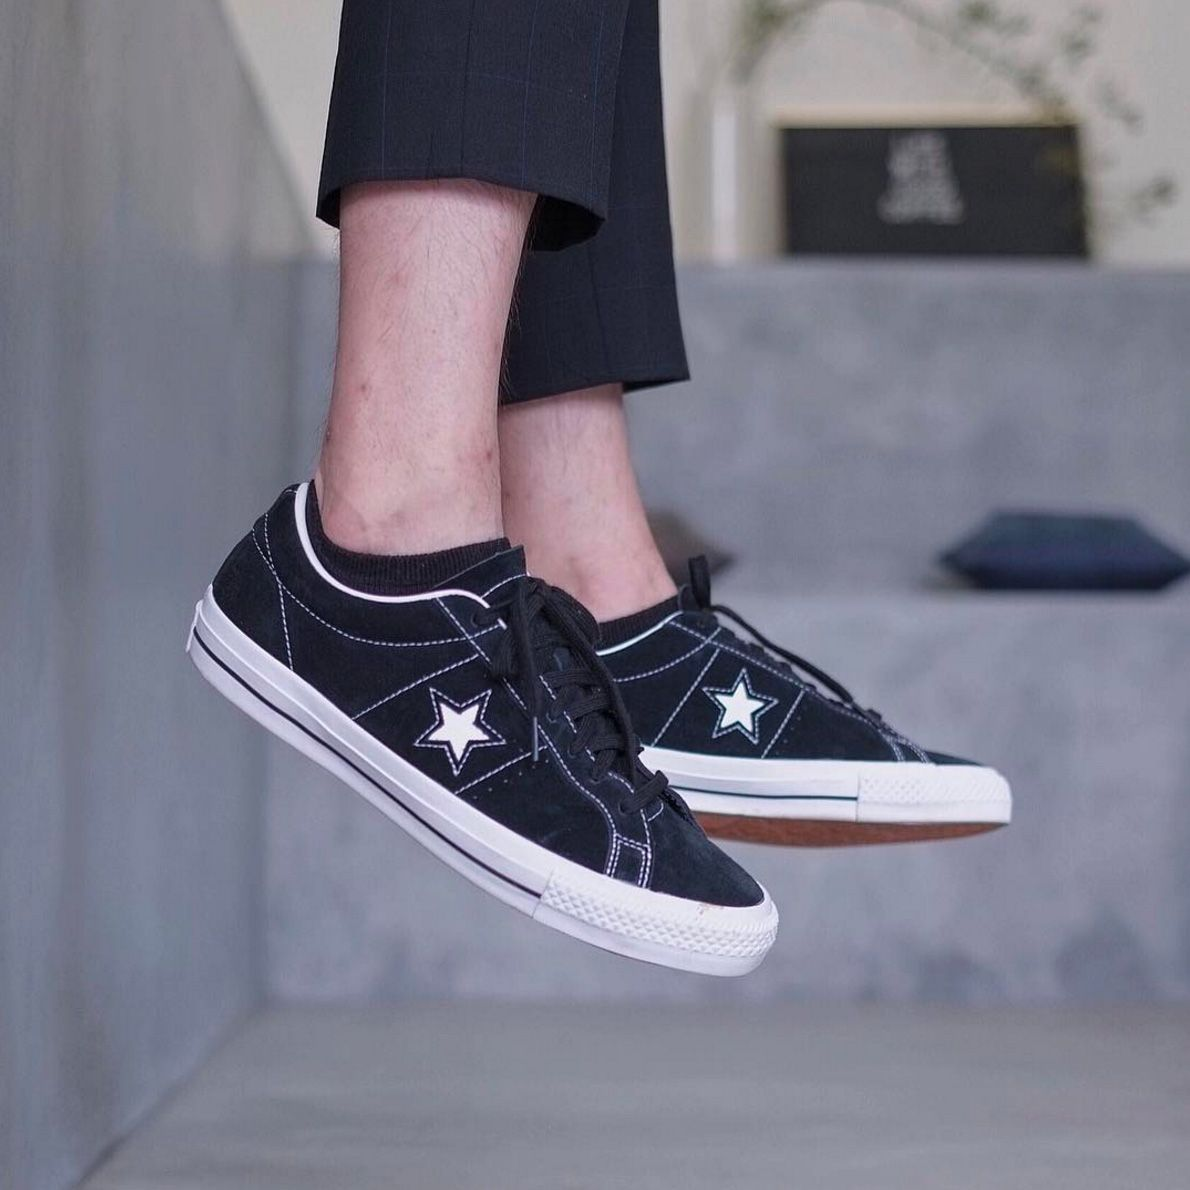 Converse One Star 9